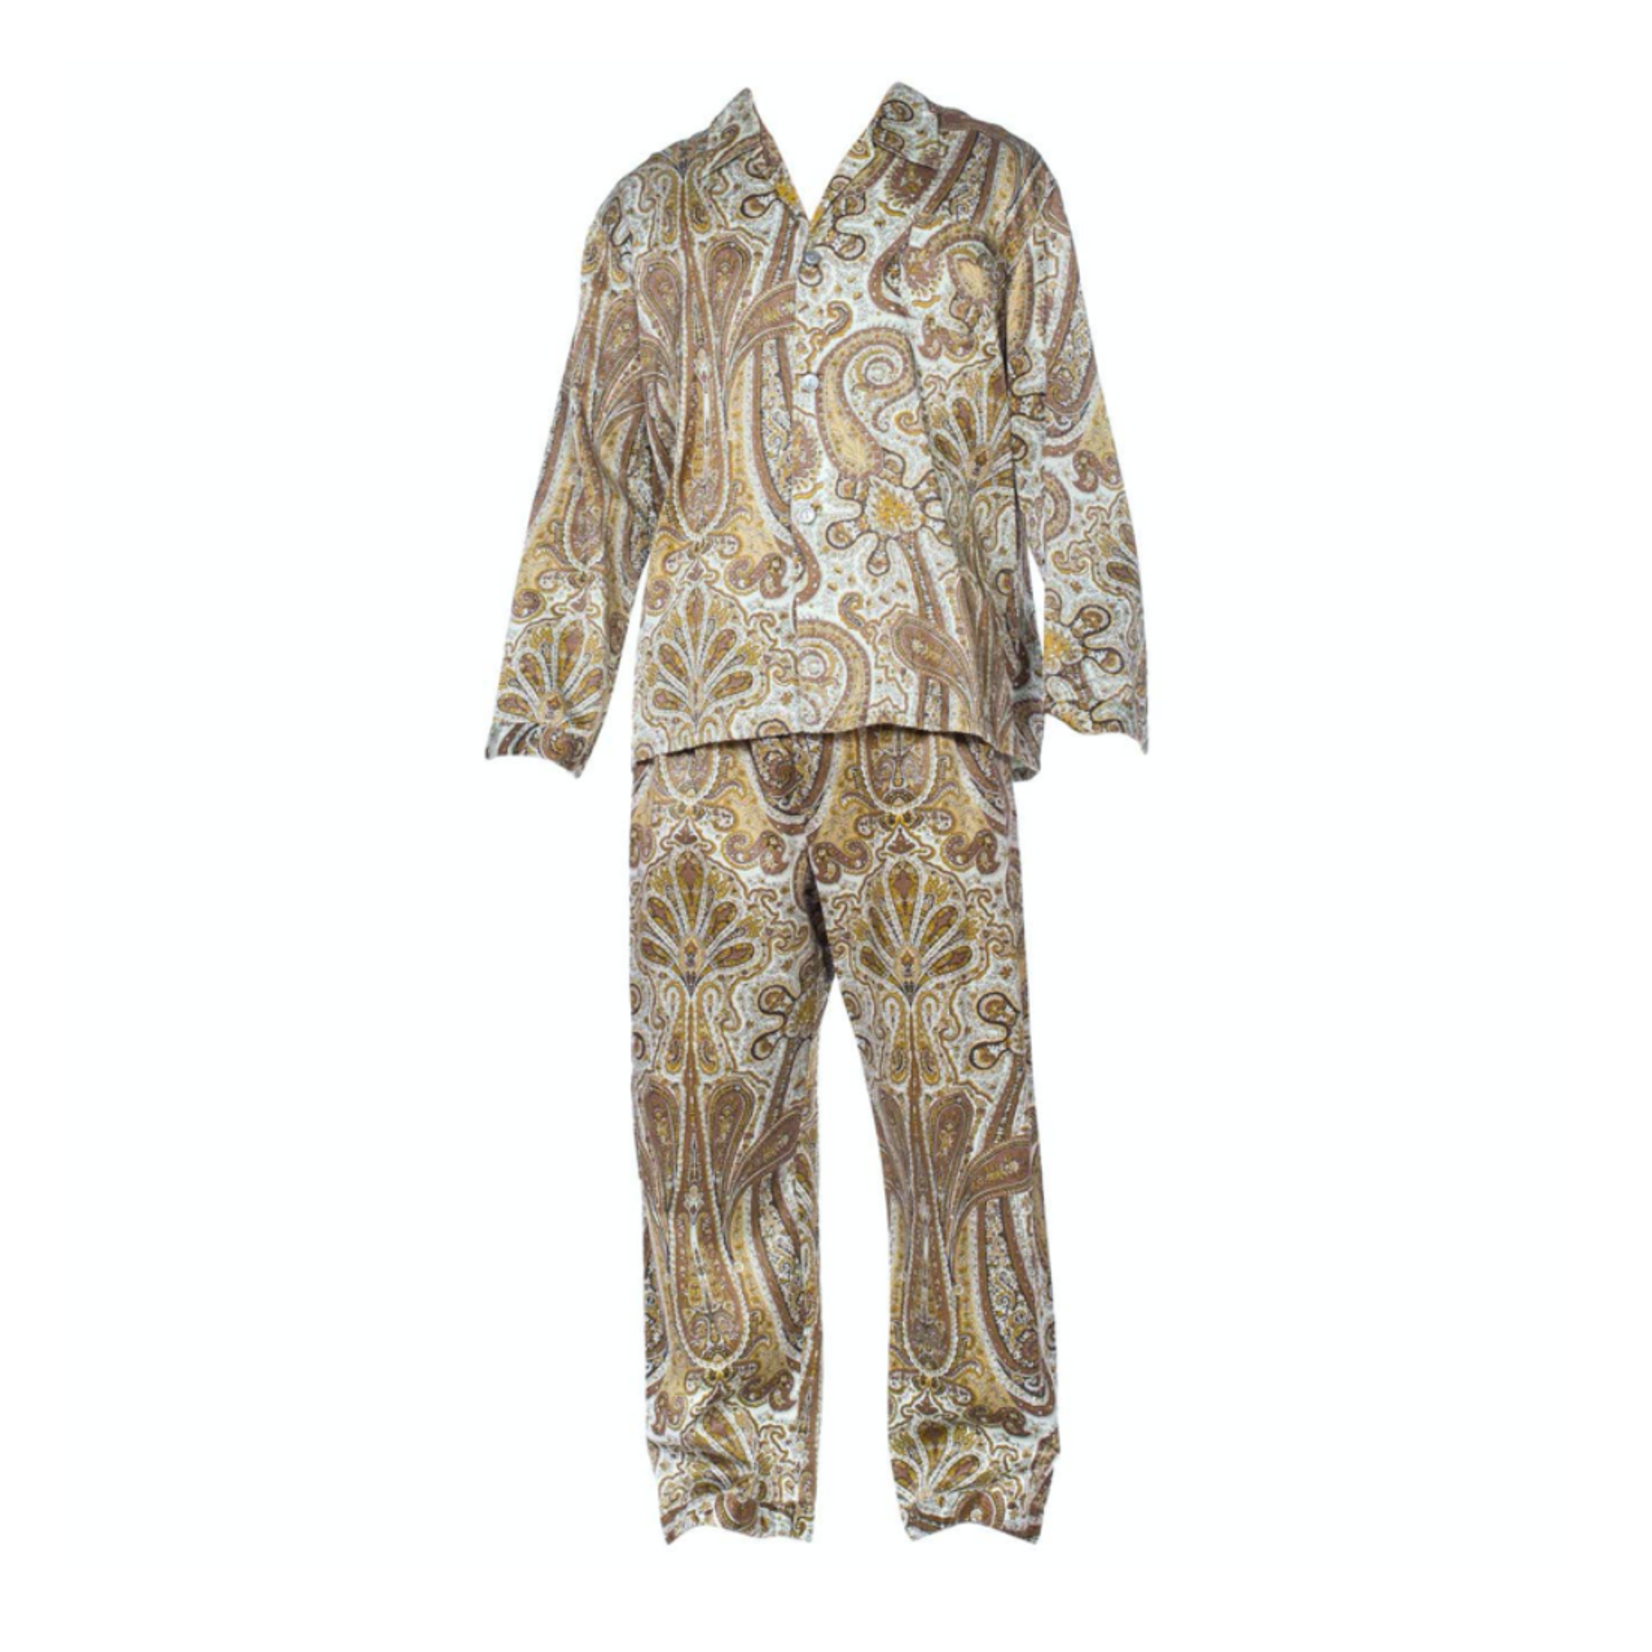 Wyld Blue Vintage 1970s Paisley Cotton Backed Rayon Satin Pajamas Set